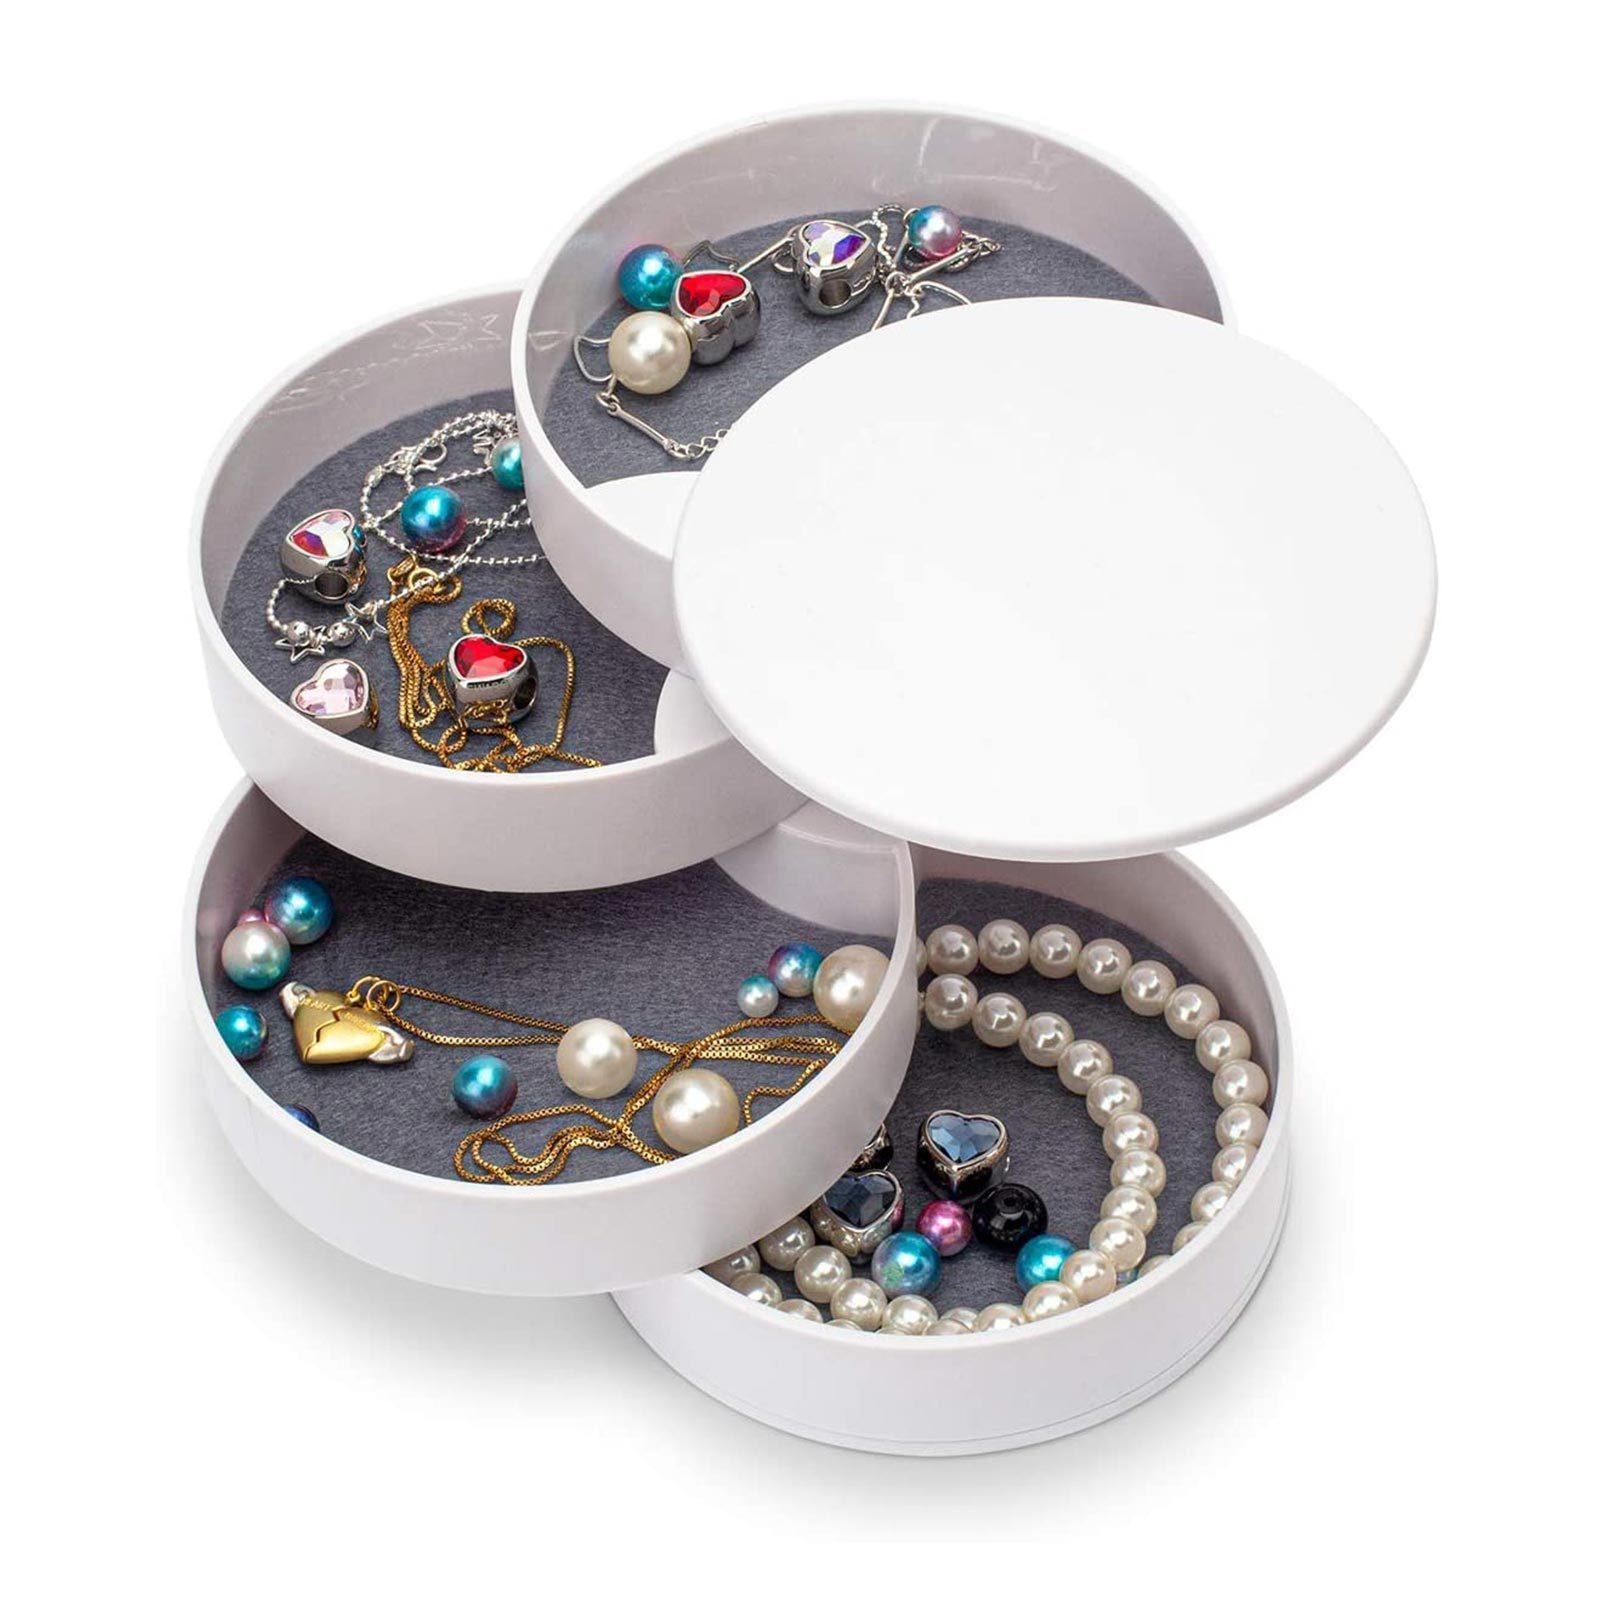 HengLiSam Jewelry Organizer